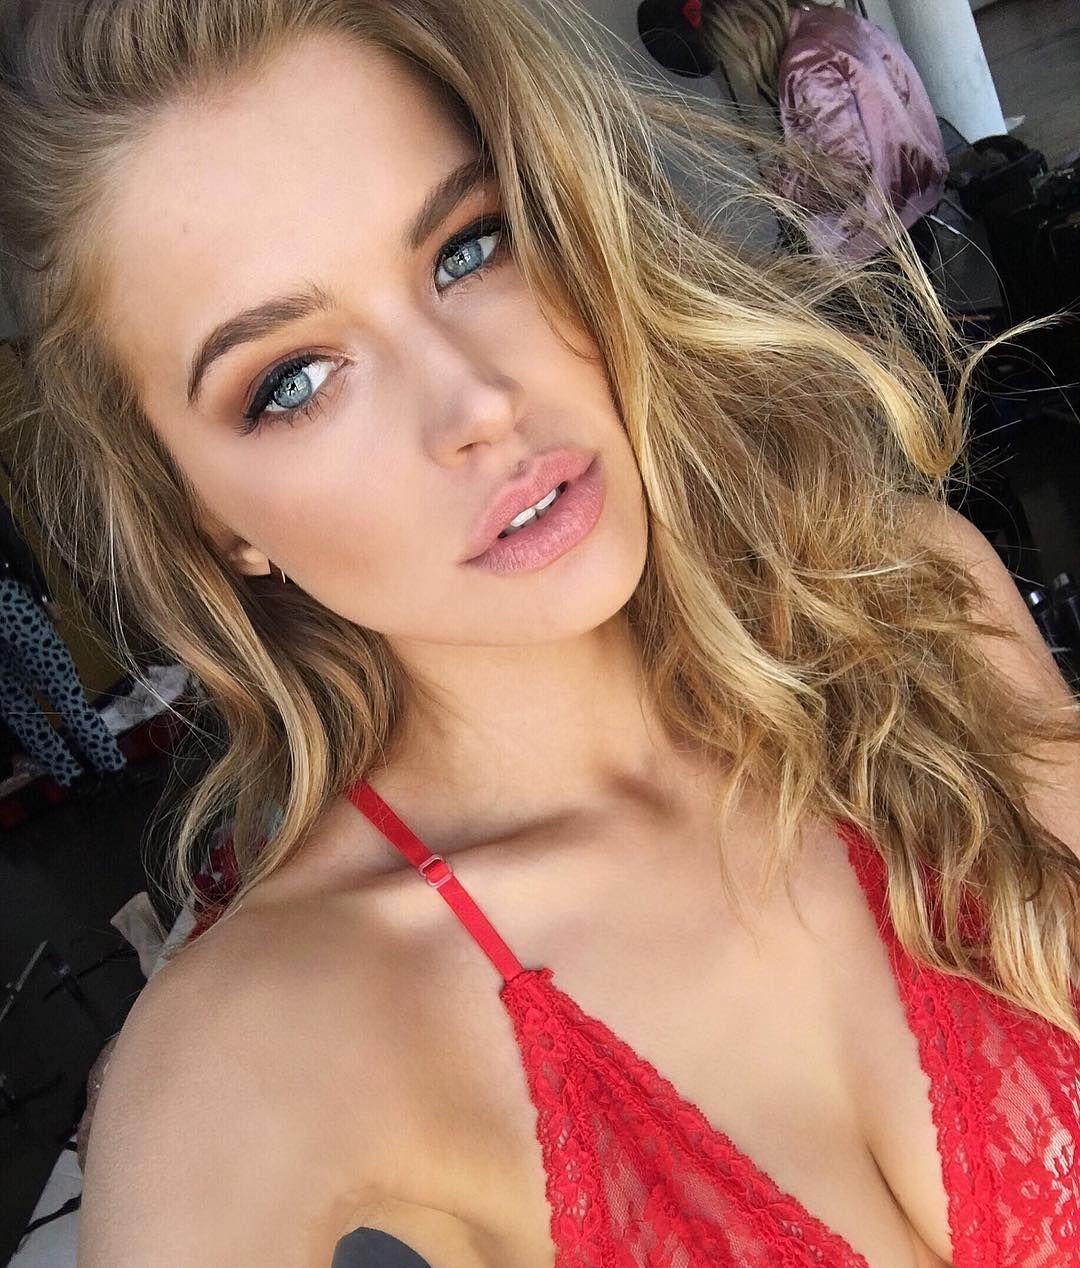 Watch Tanya mityushina sexy 7 Photos video